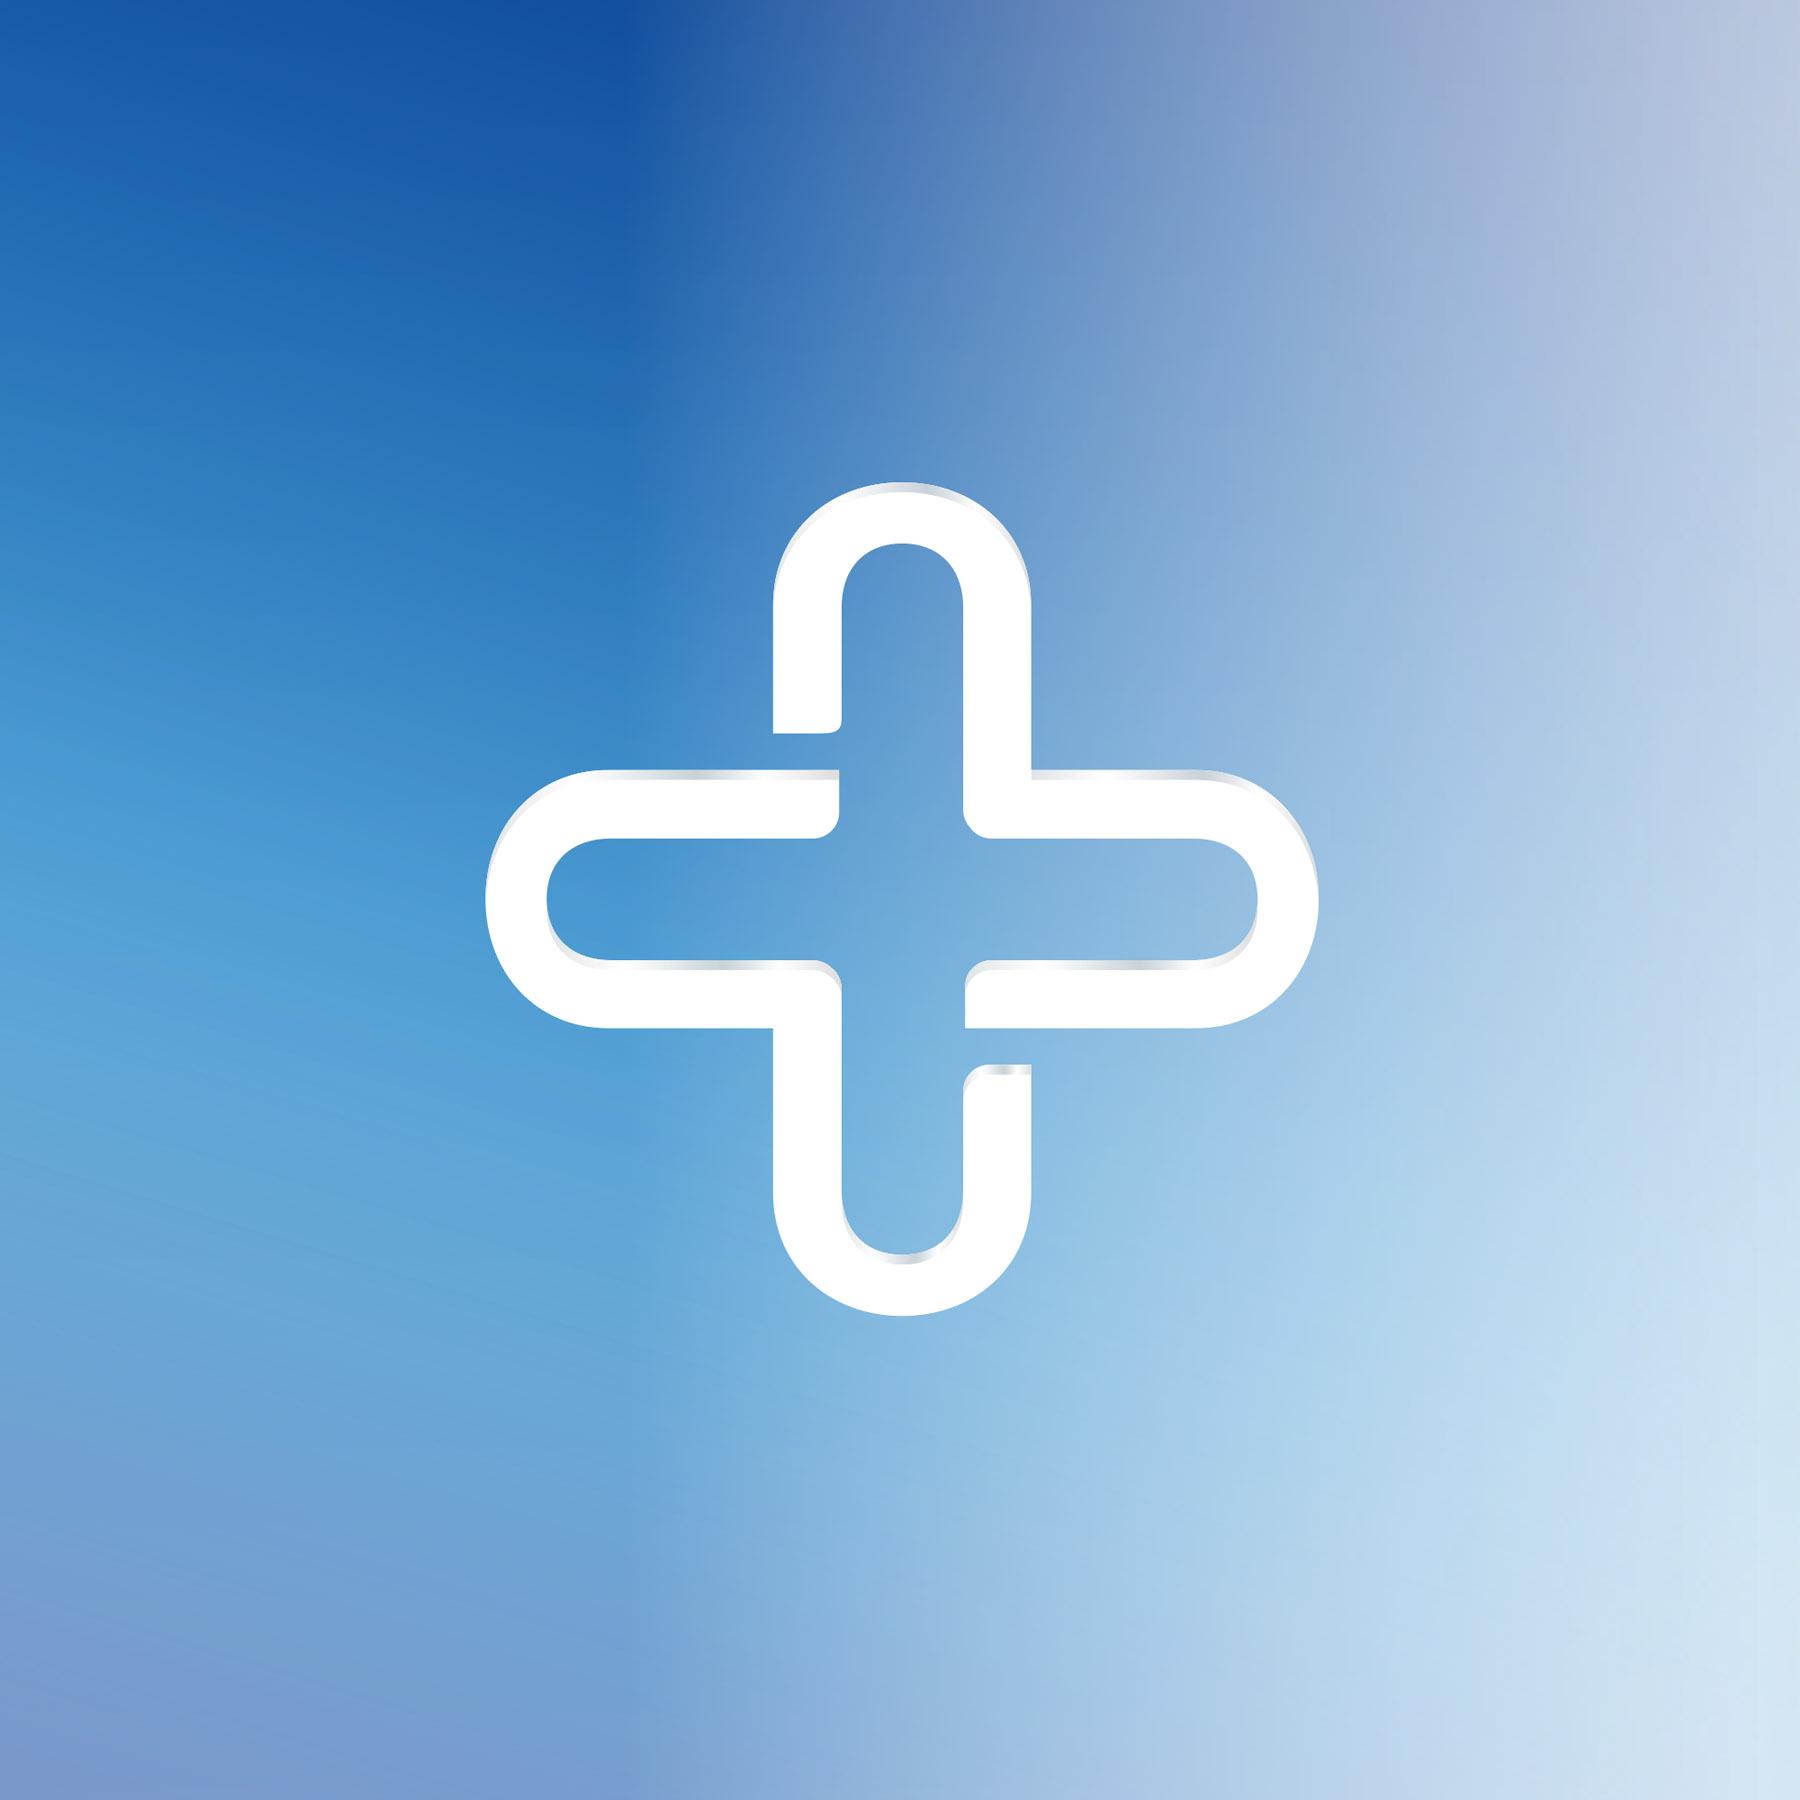 USP Zdrowie Cross Symbol Design